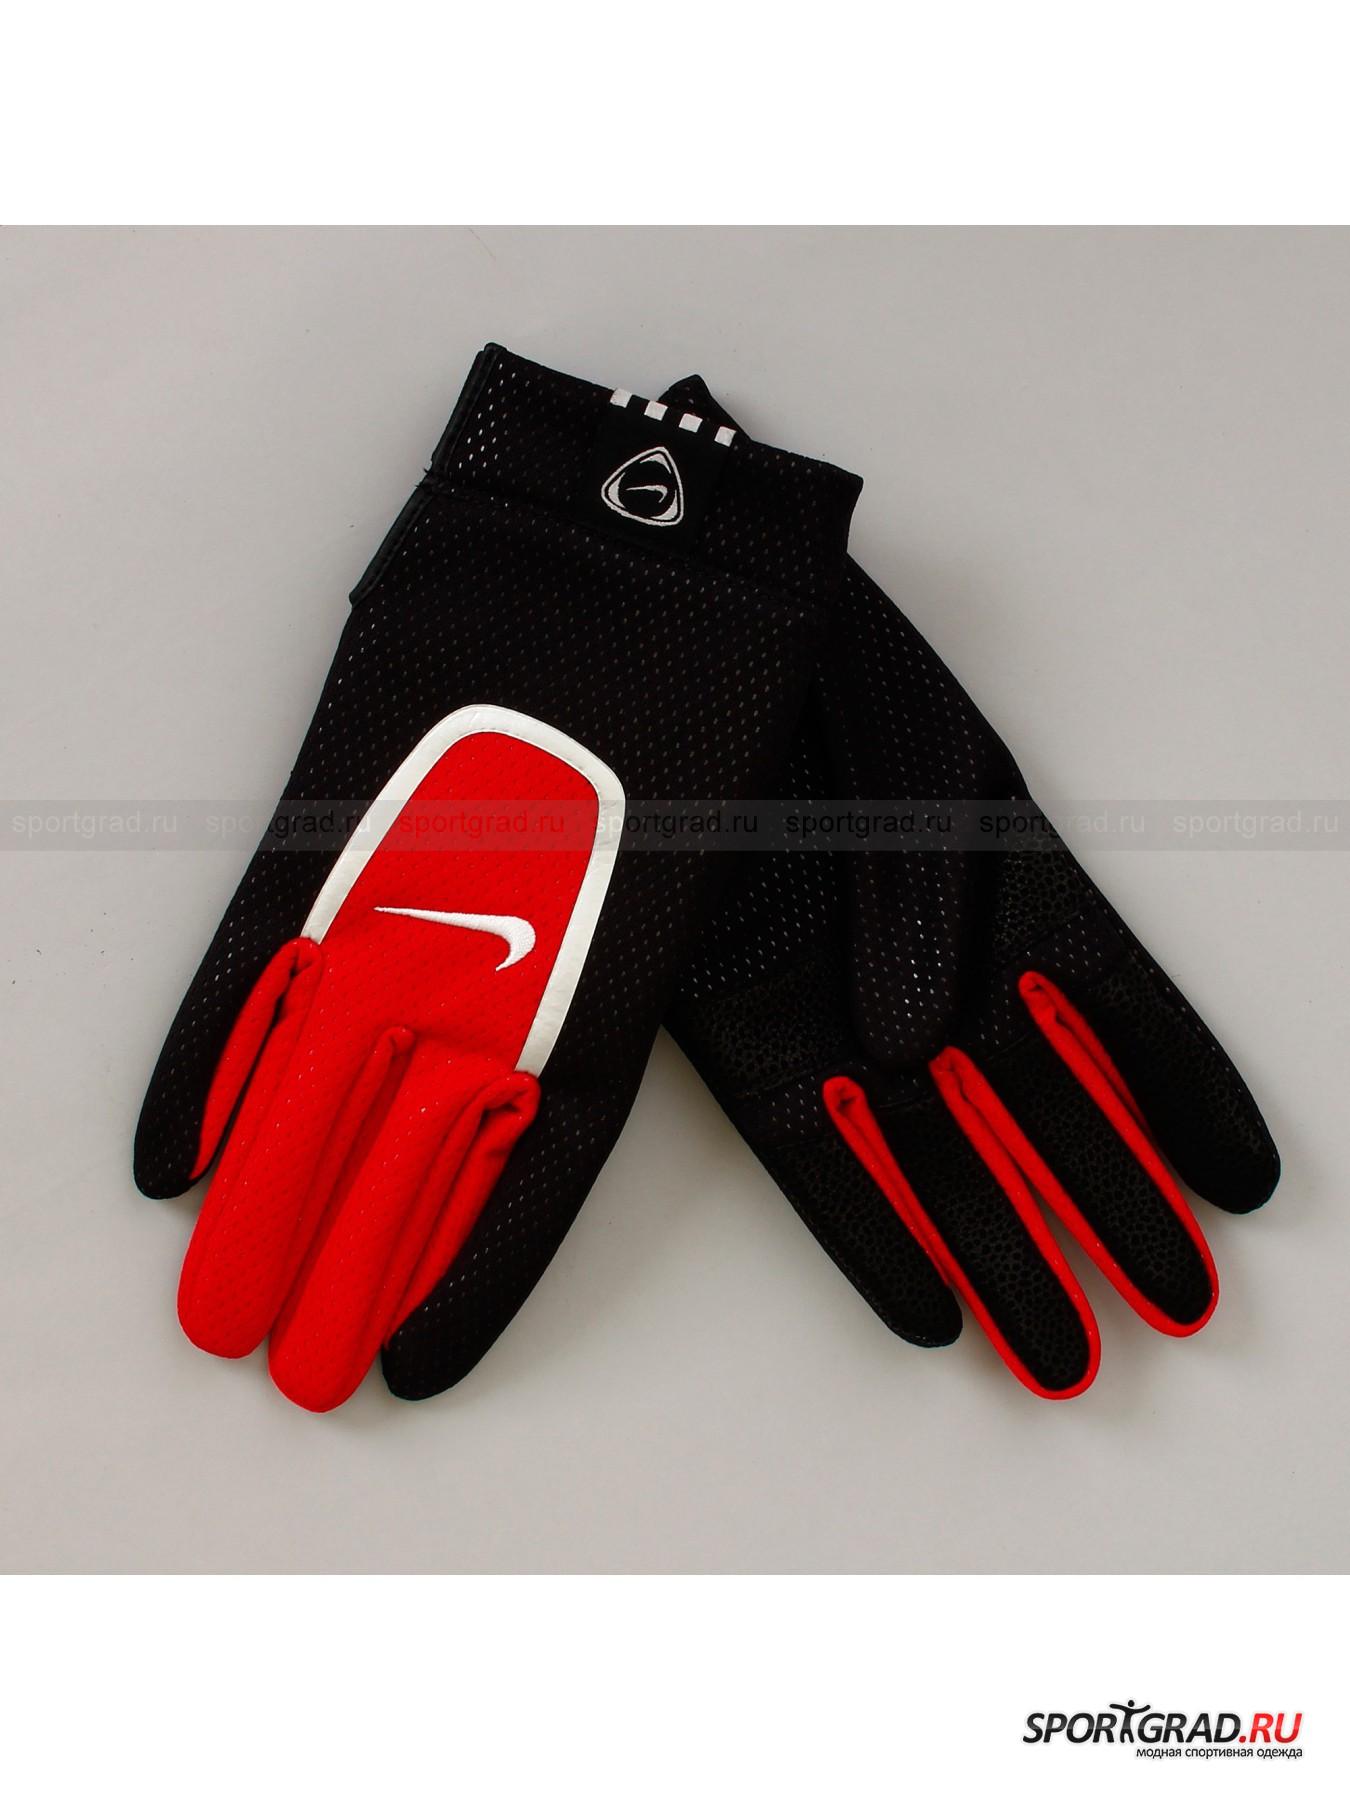 Перчатки для футбола Field player glove V NIKE